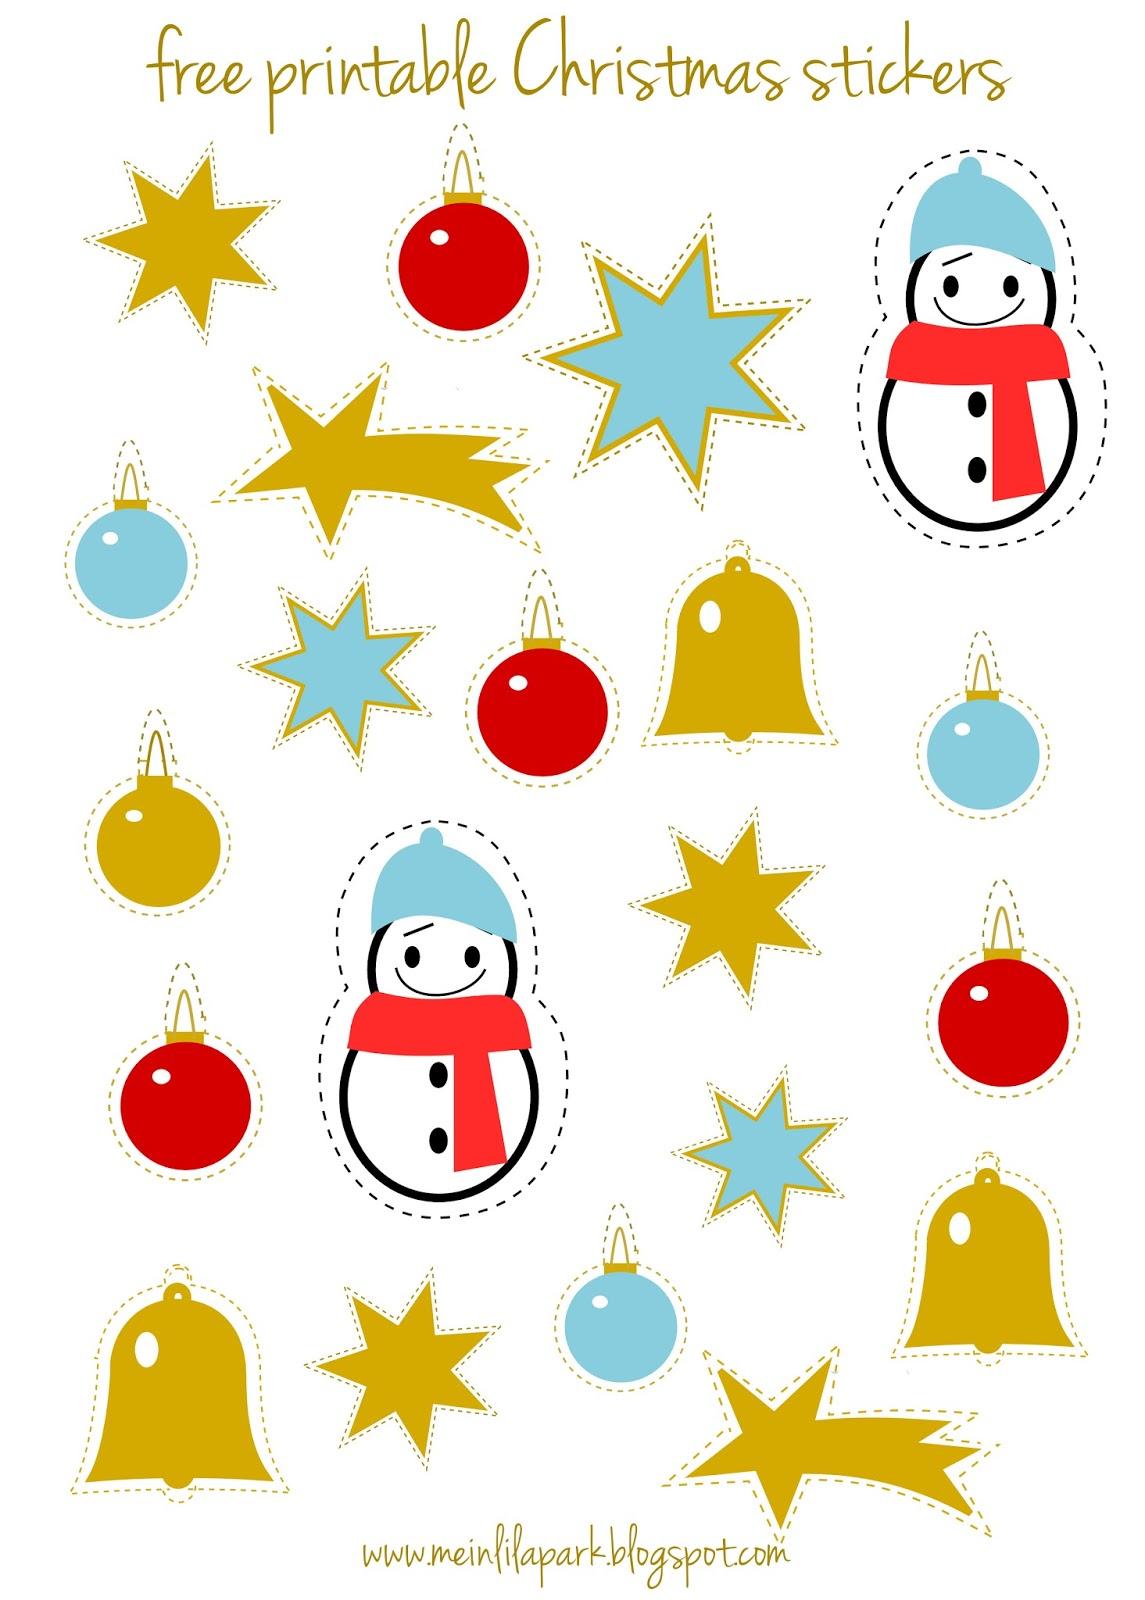 Free printable Christmas planner stickers - Agendasticker ...